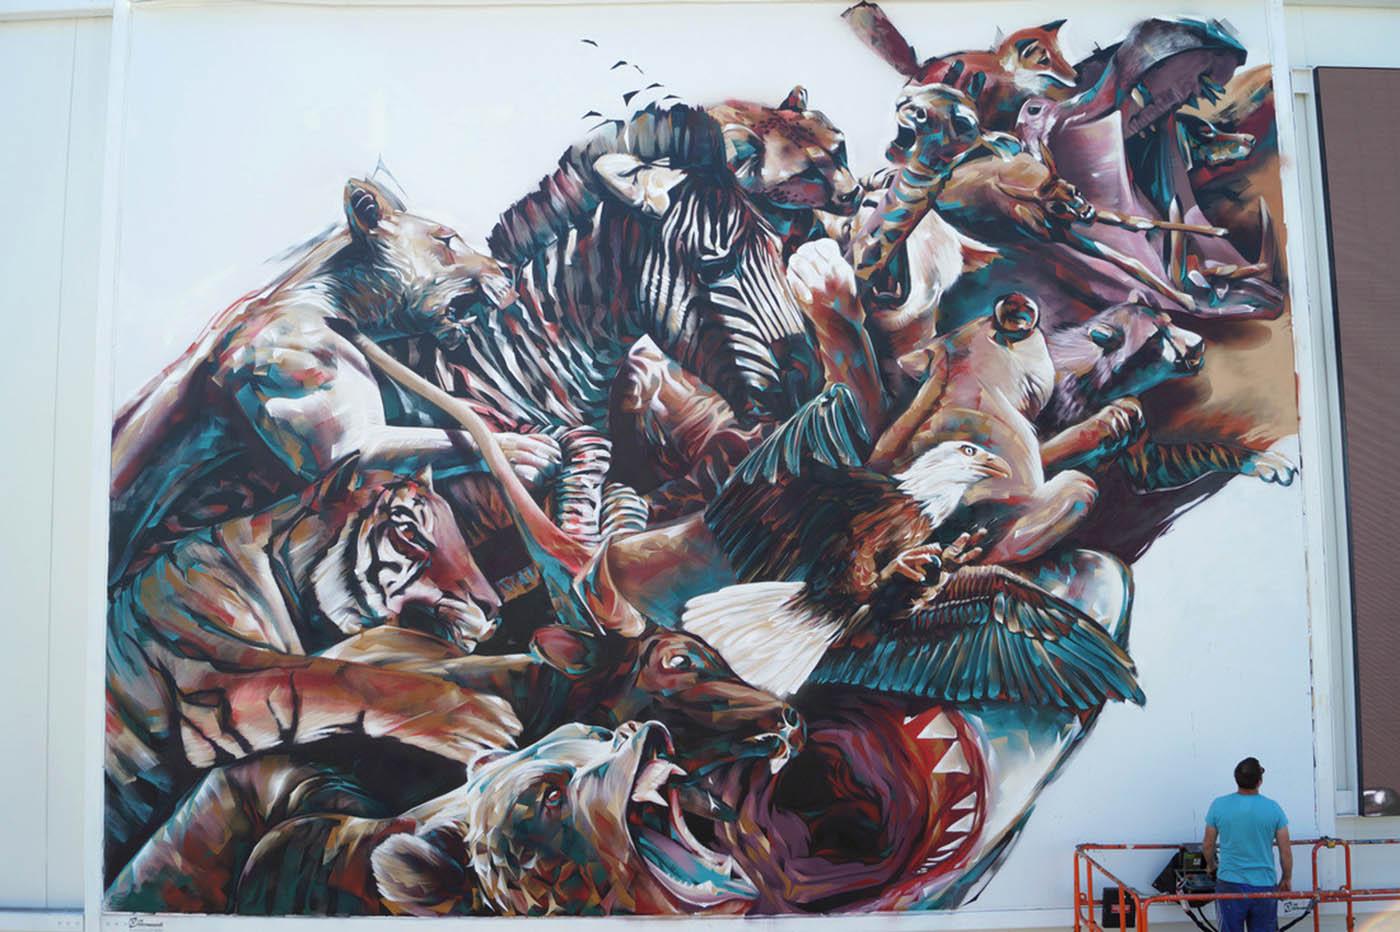 https://www.propaganza.be/wp-content/uploads/2019/04/steve-locatelli-animals-painting-mural-fresco-surrealism-propaganza-urban-artist-graffiti-graff-street-art-spray-painting-belgium.jpg